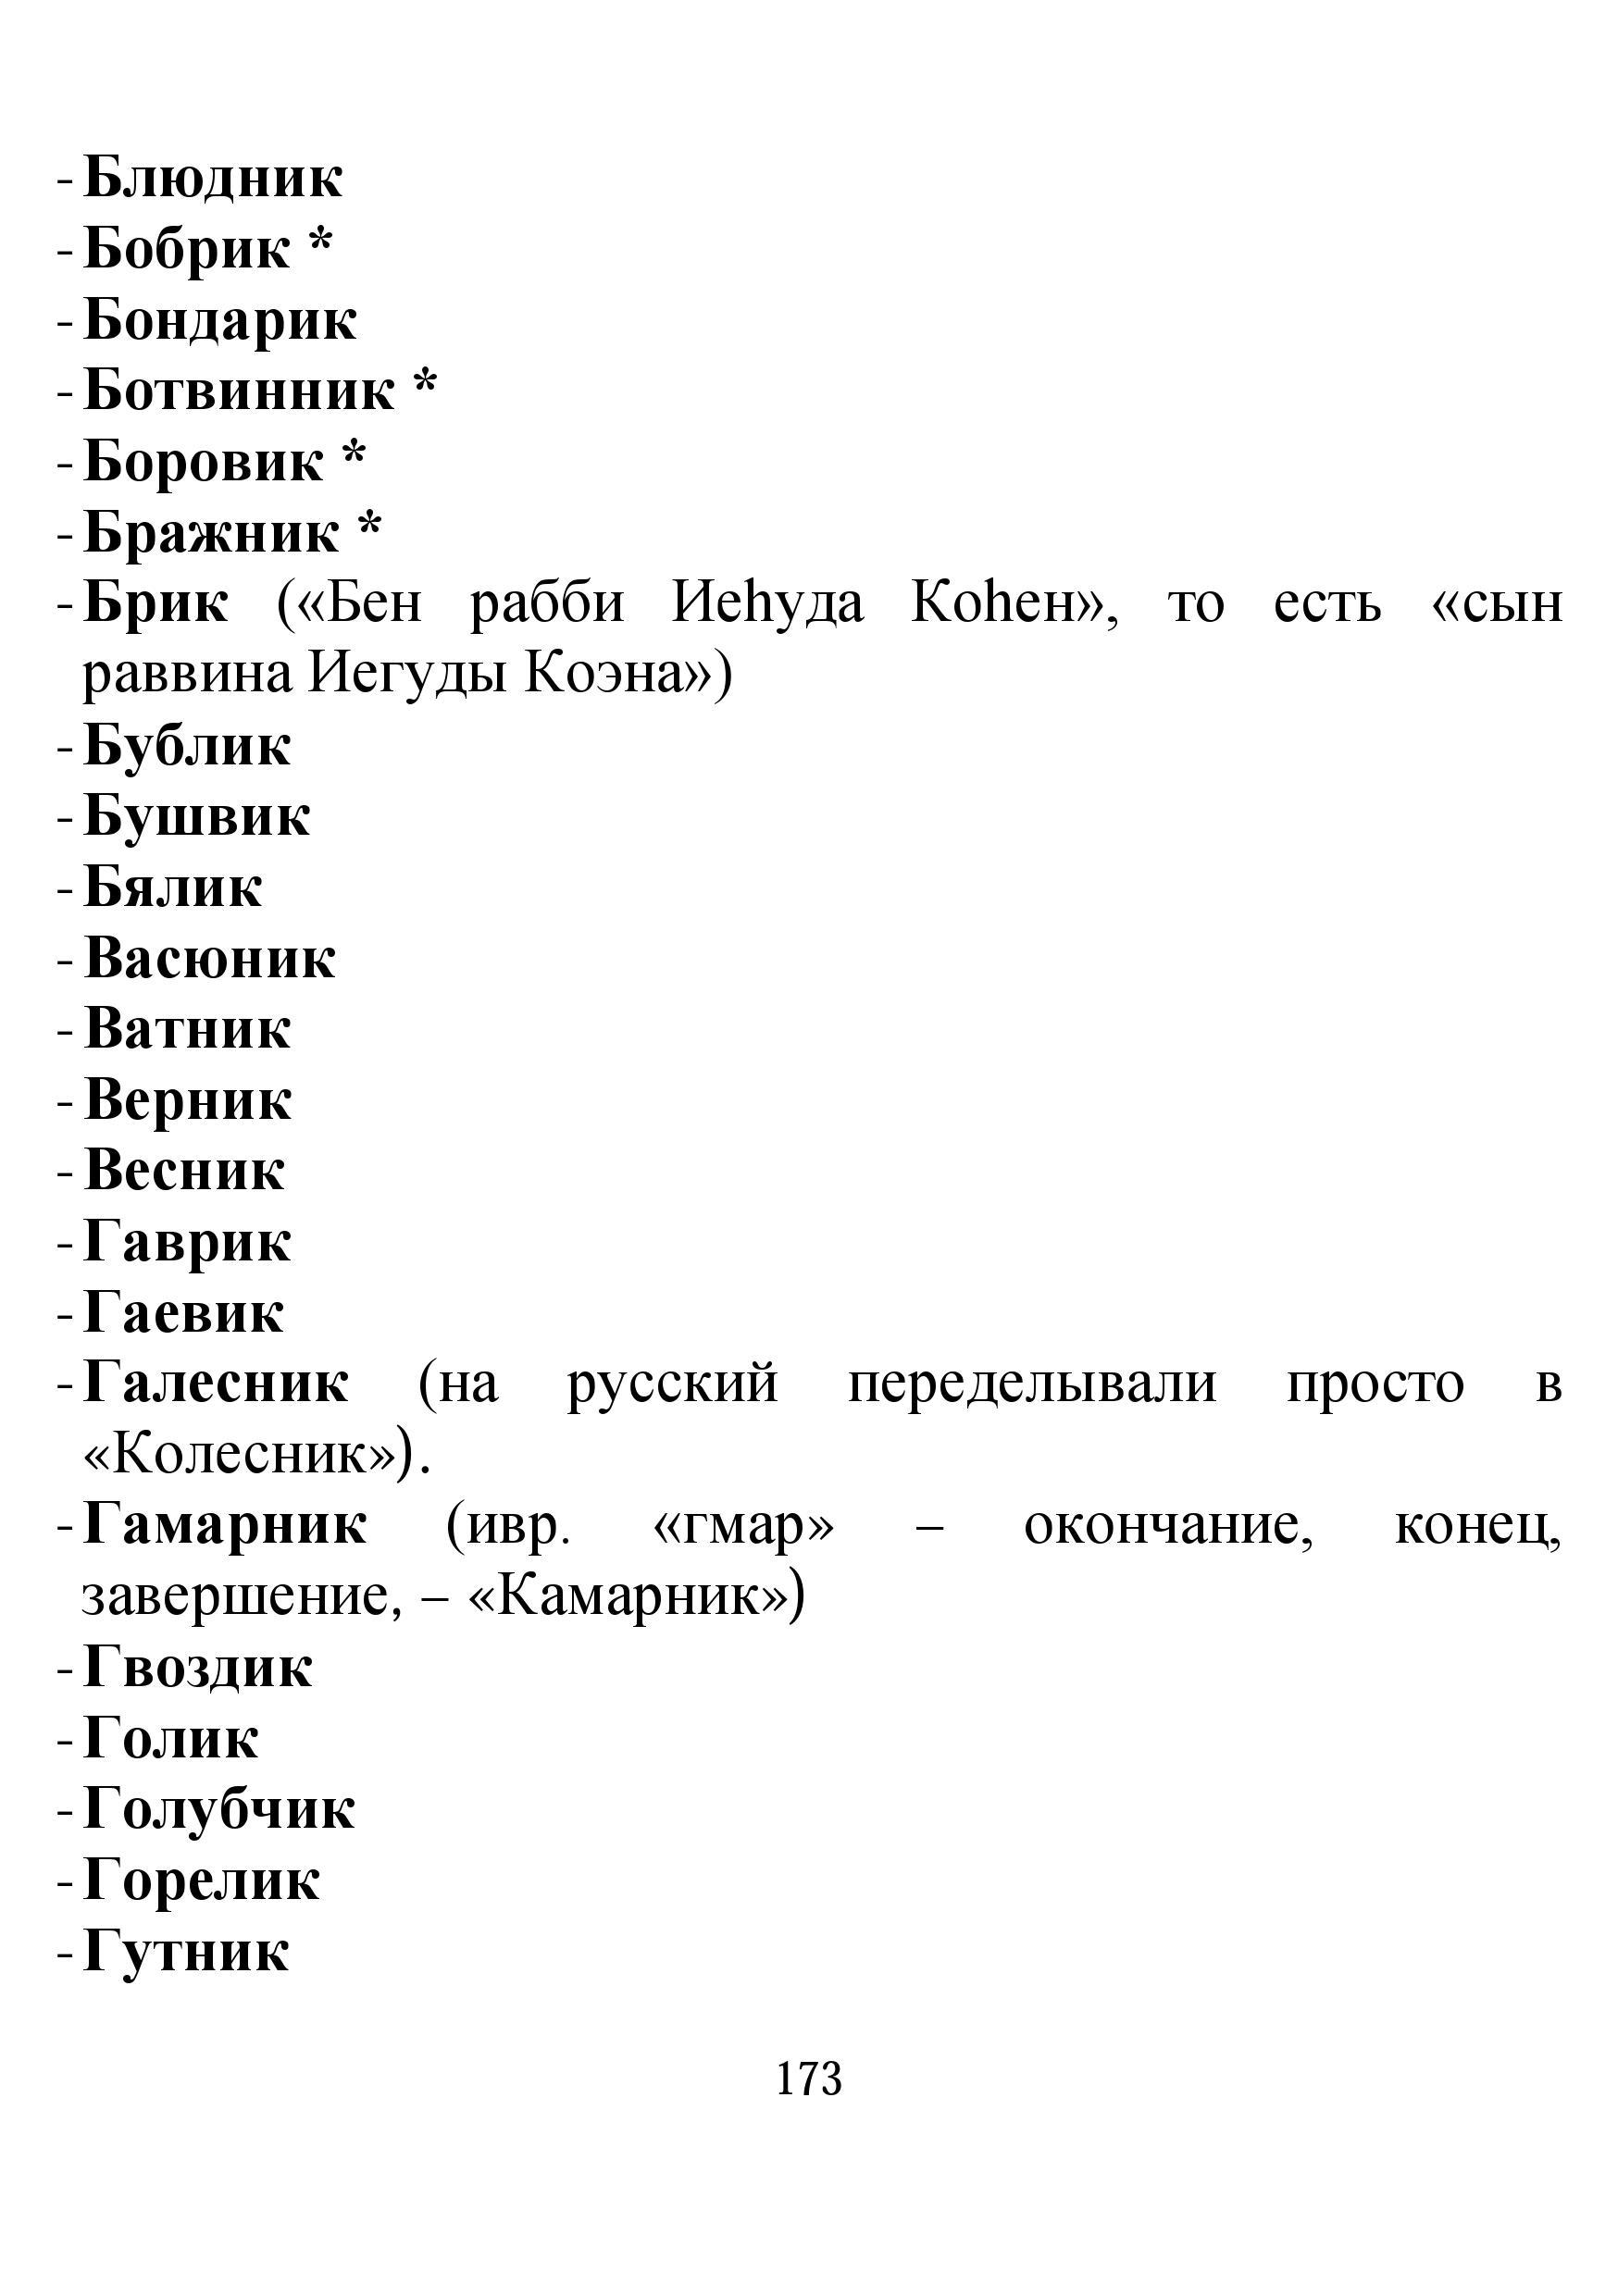 http://sf.uploads.ru/4Pjbm.jpg